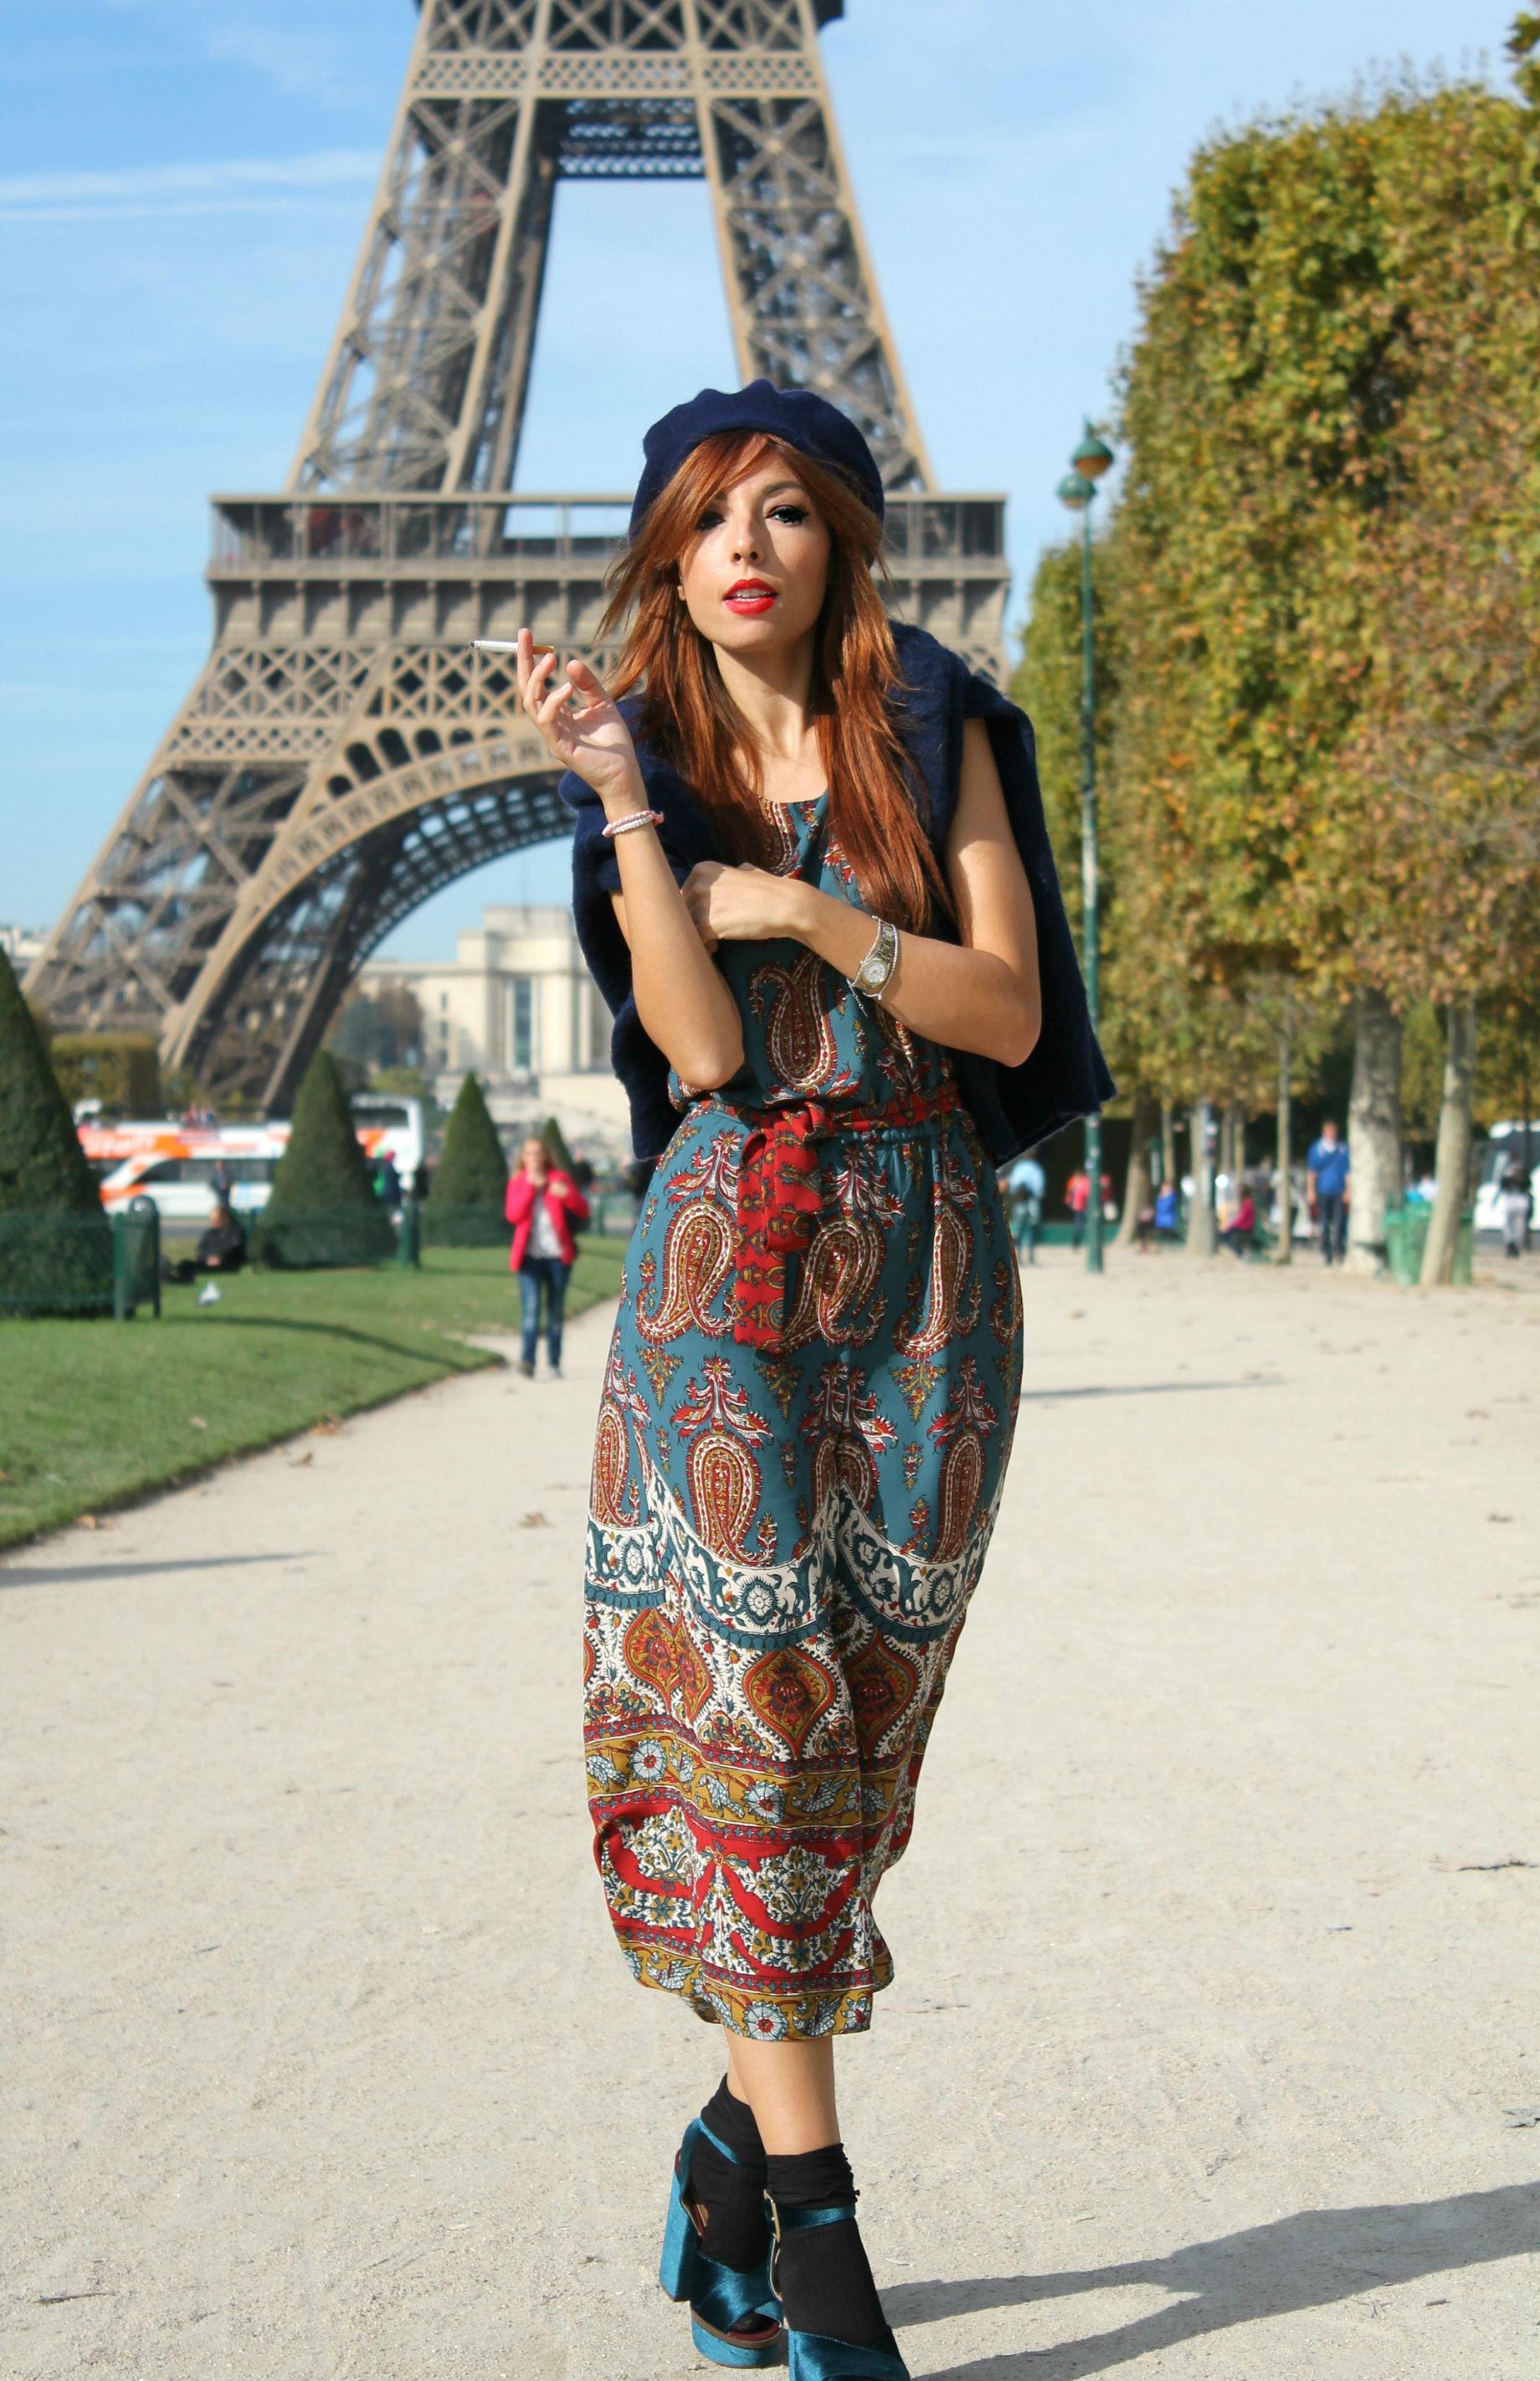 cosa succede nel mondo, theladycracy.it, elisa bellino, fashion blog italia, fashion blogger italiane, outfit paris, _